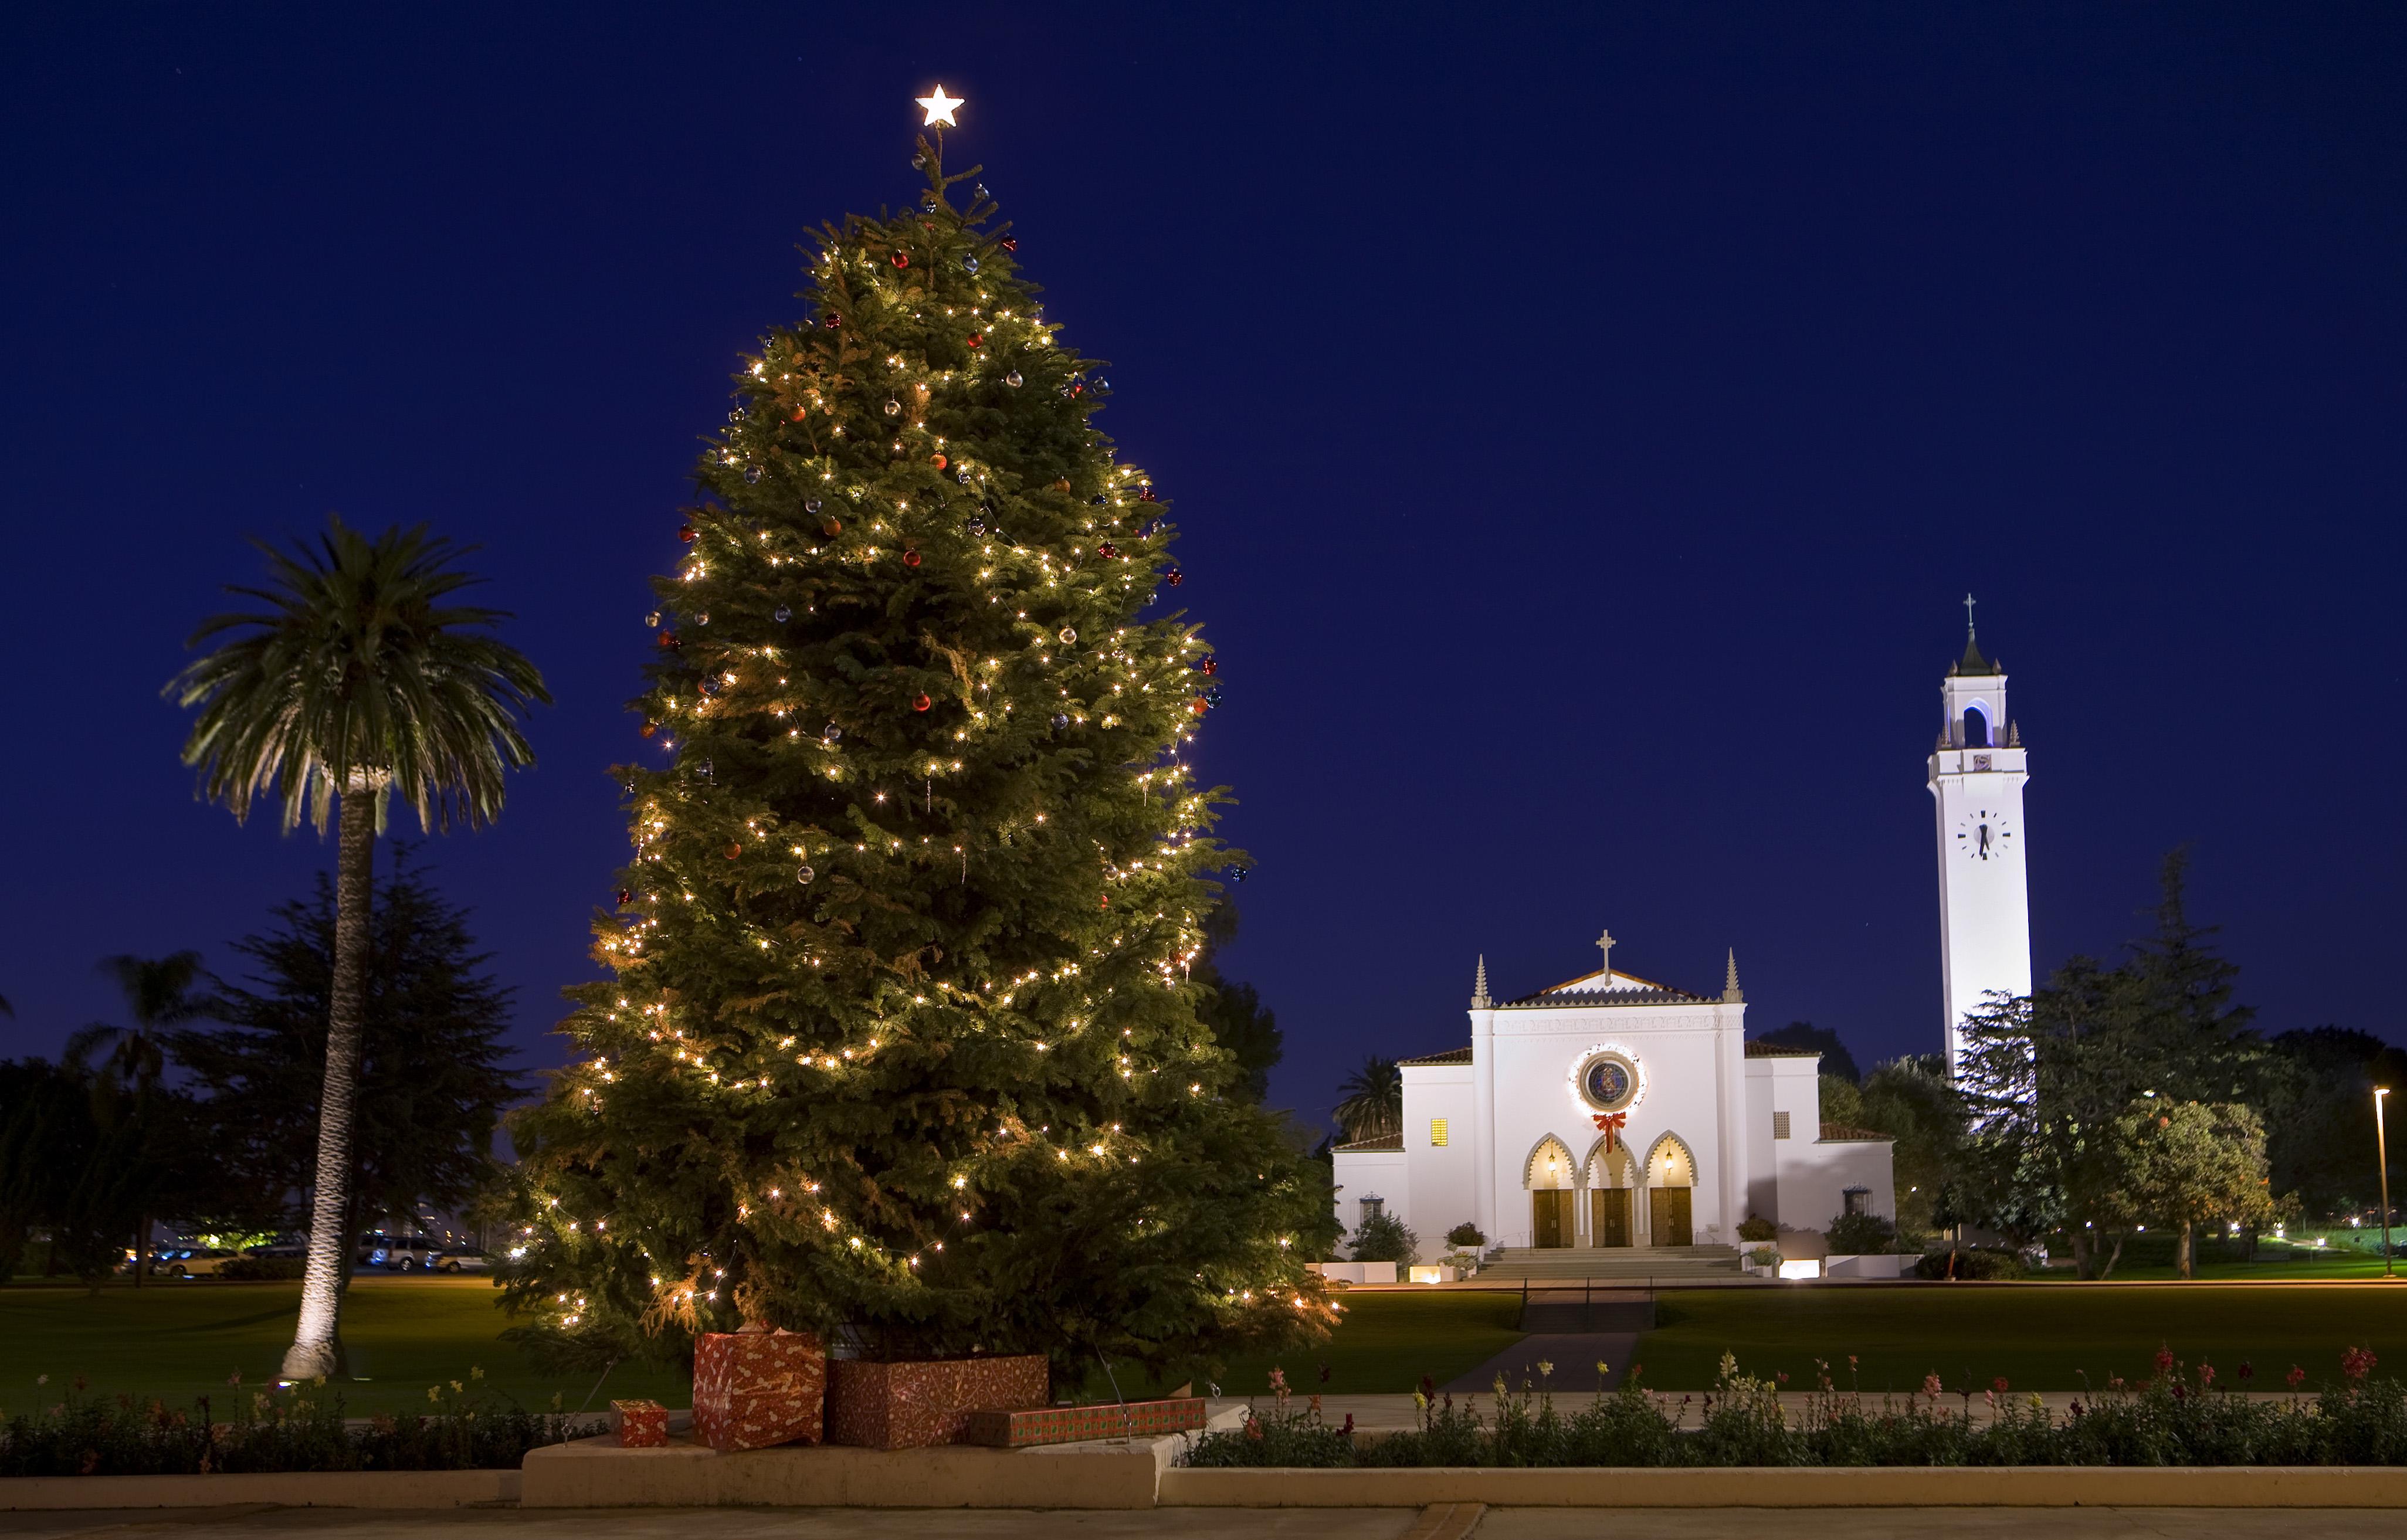 Lmu Christmas Tree Lighting 2020 Ceremony 2016 Christmas Greeting   Loyola Marymount University